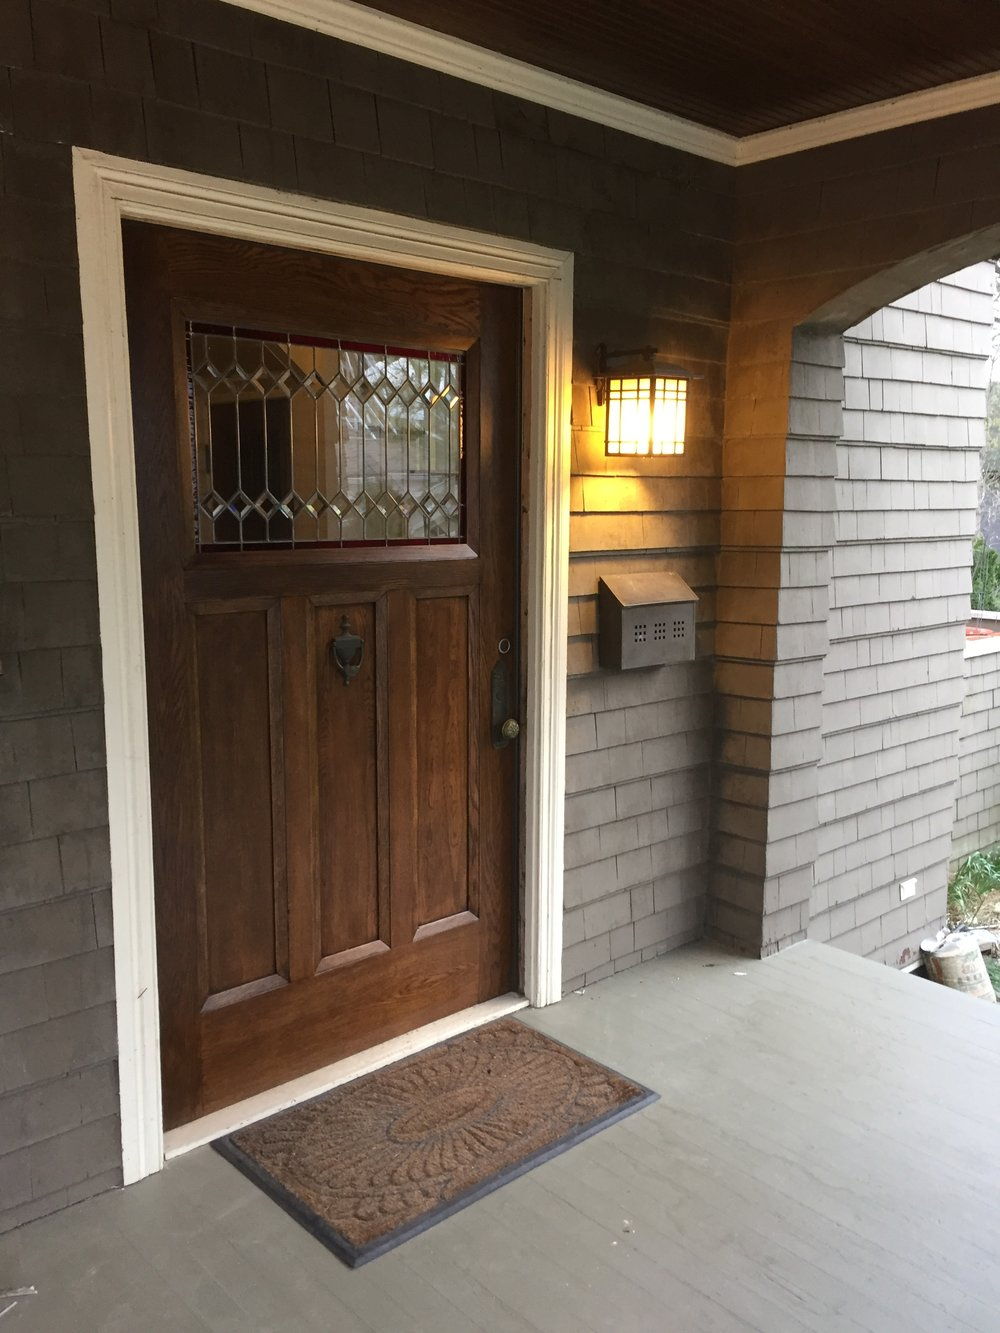 & Door Restoration \u2014 Michigan Historic Restoration Co.